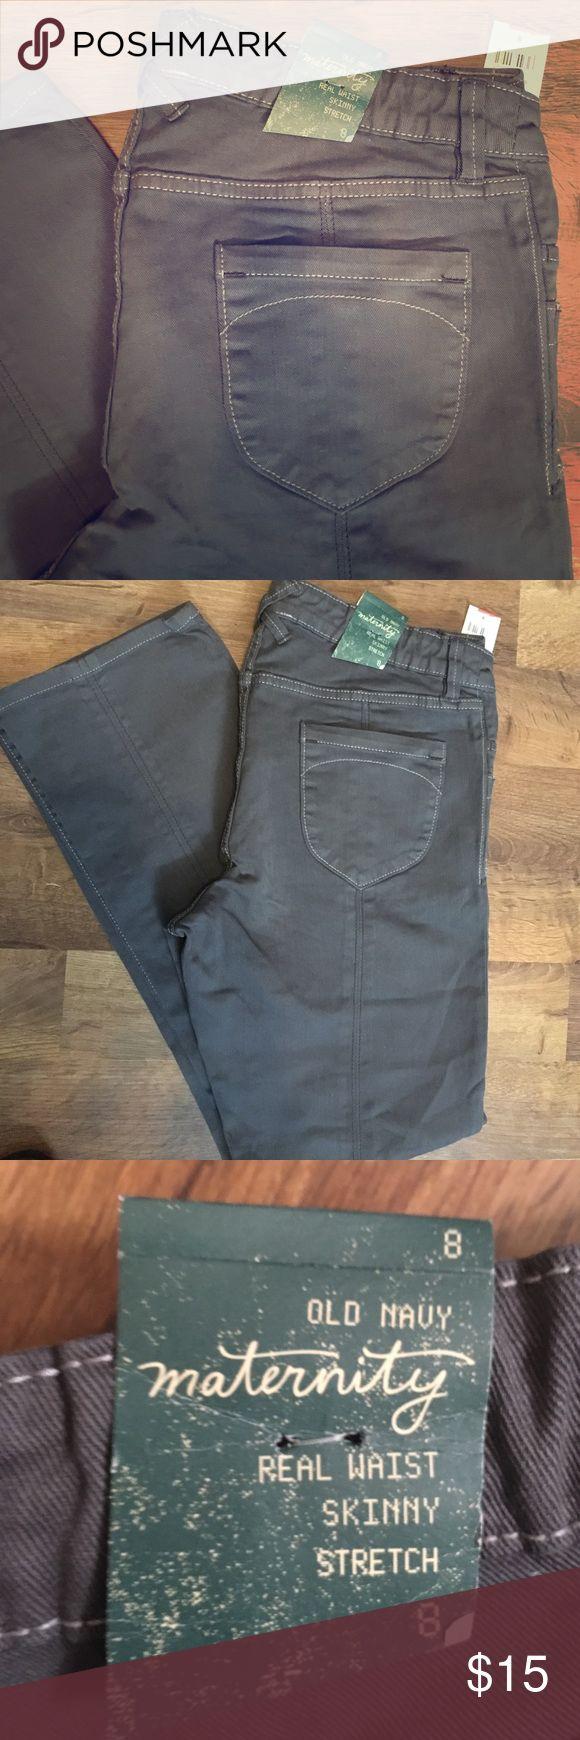 Brand new maternity skinny jeans Brand new Old Navy maternity real waist. Old Navy Pants Skinny